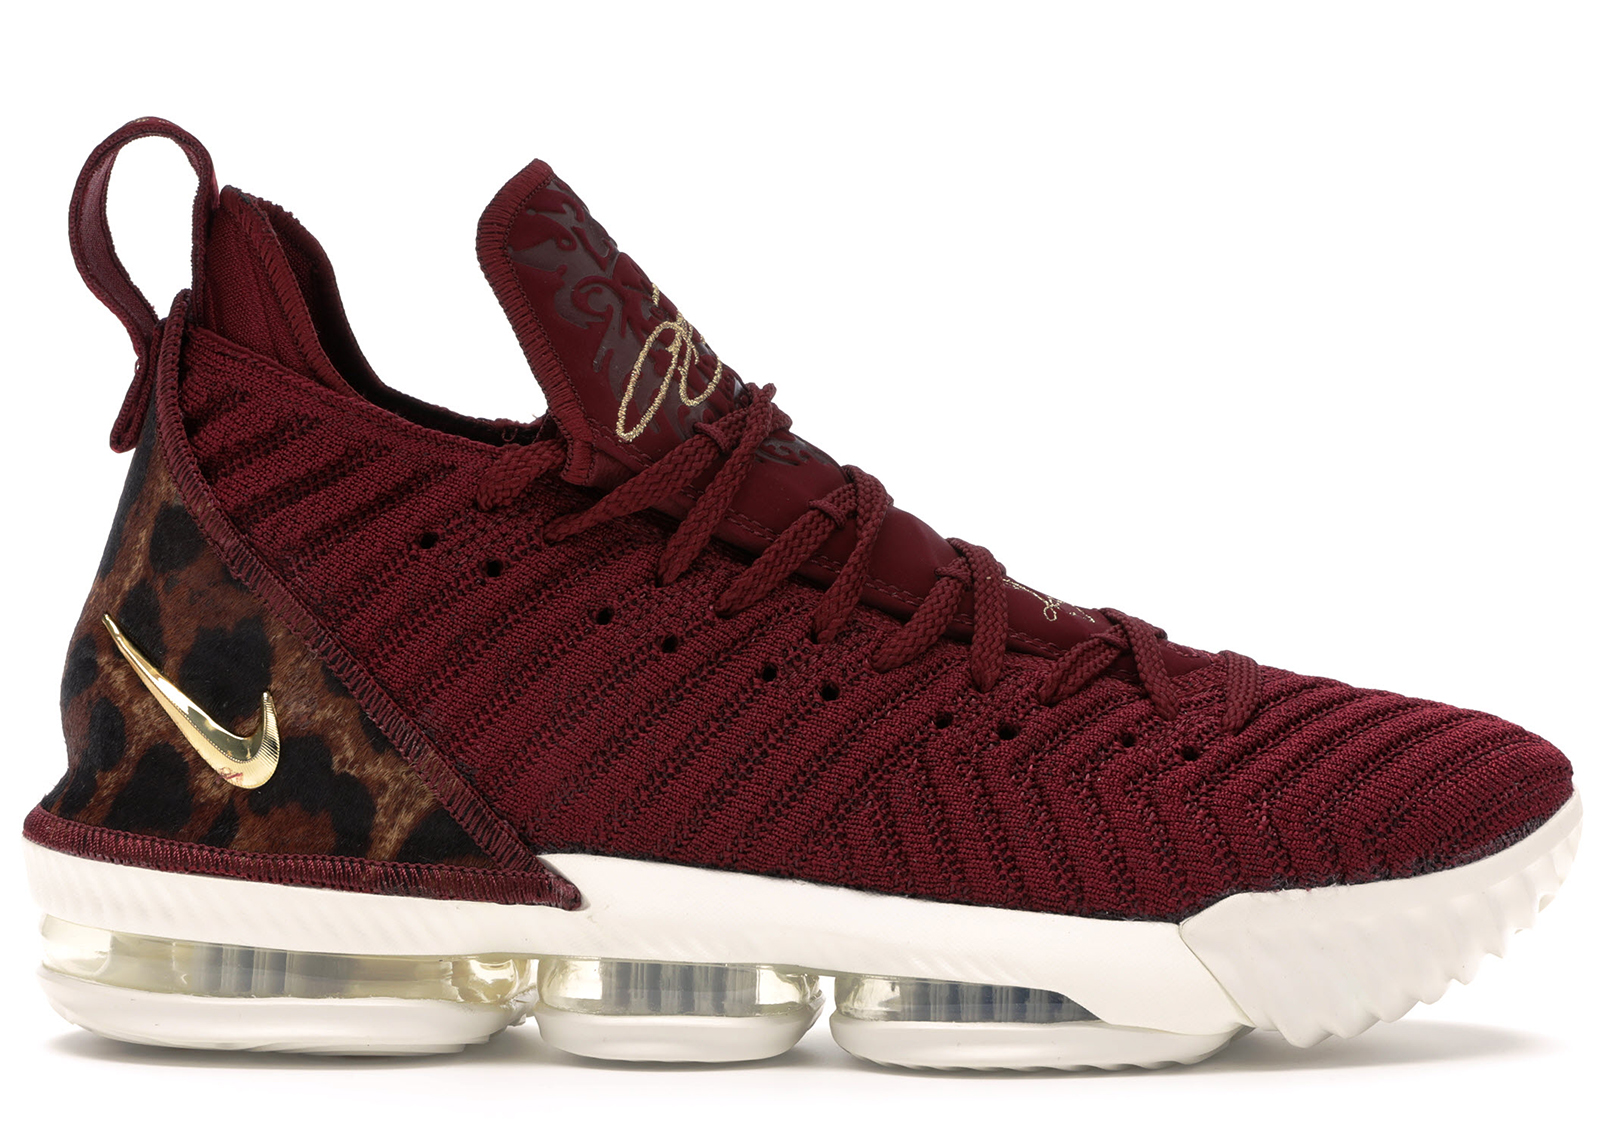 Nike LeBron 16 King - AO2588-601/AO2595-601